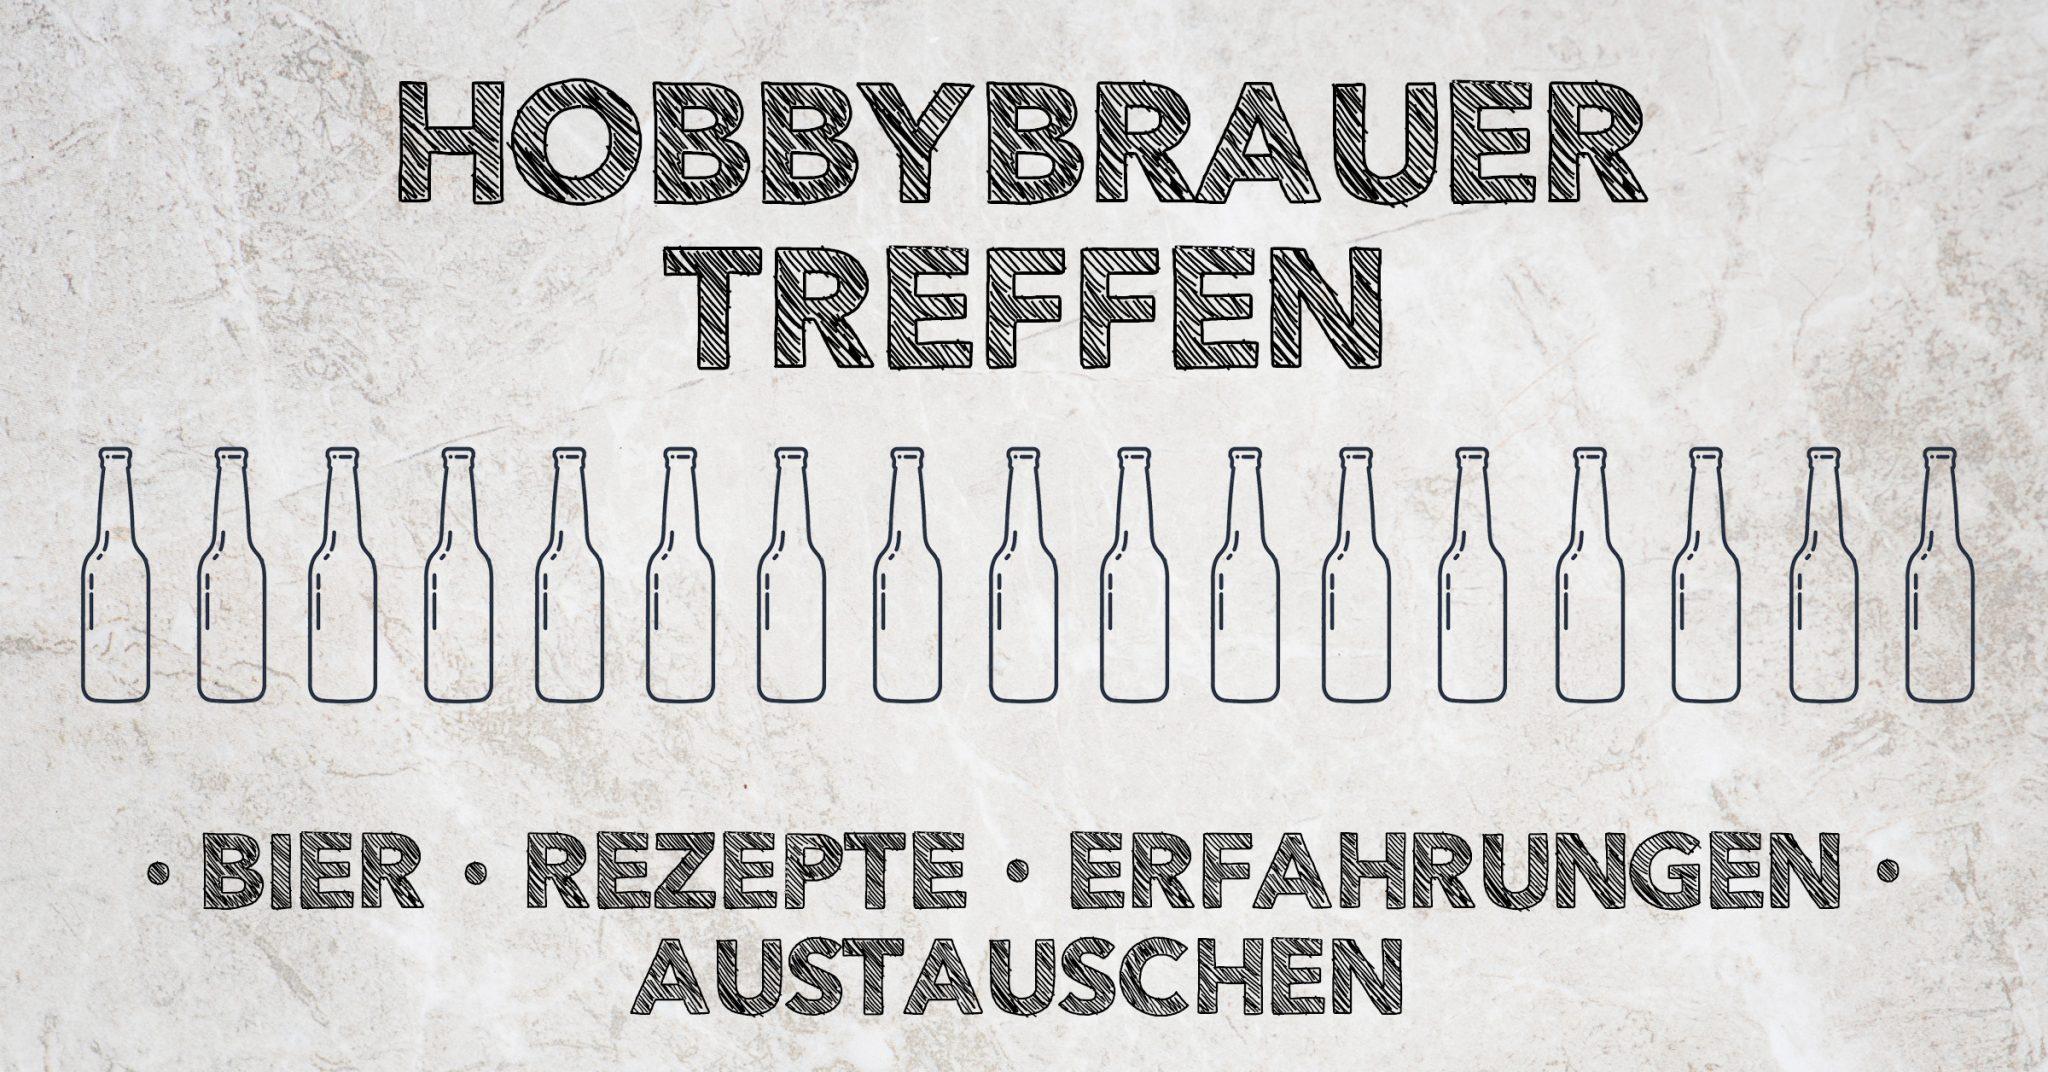 Hobbybrauer Treffen Bierbude Duisburg